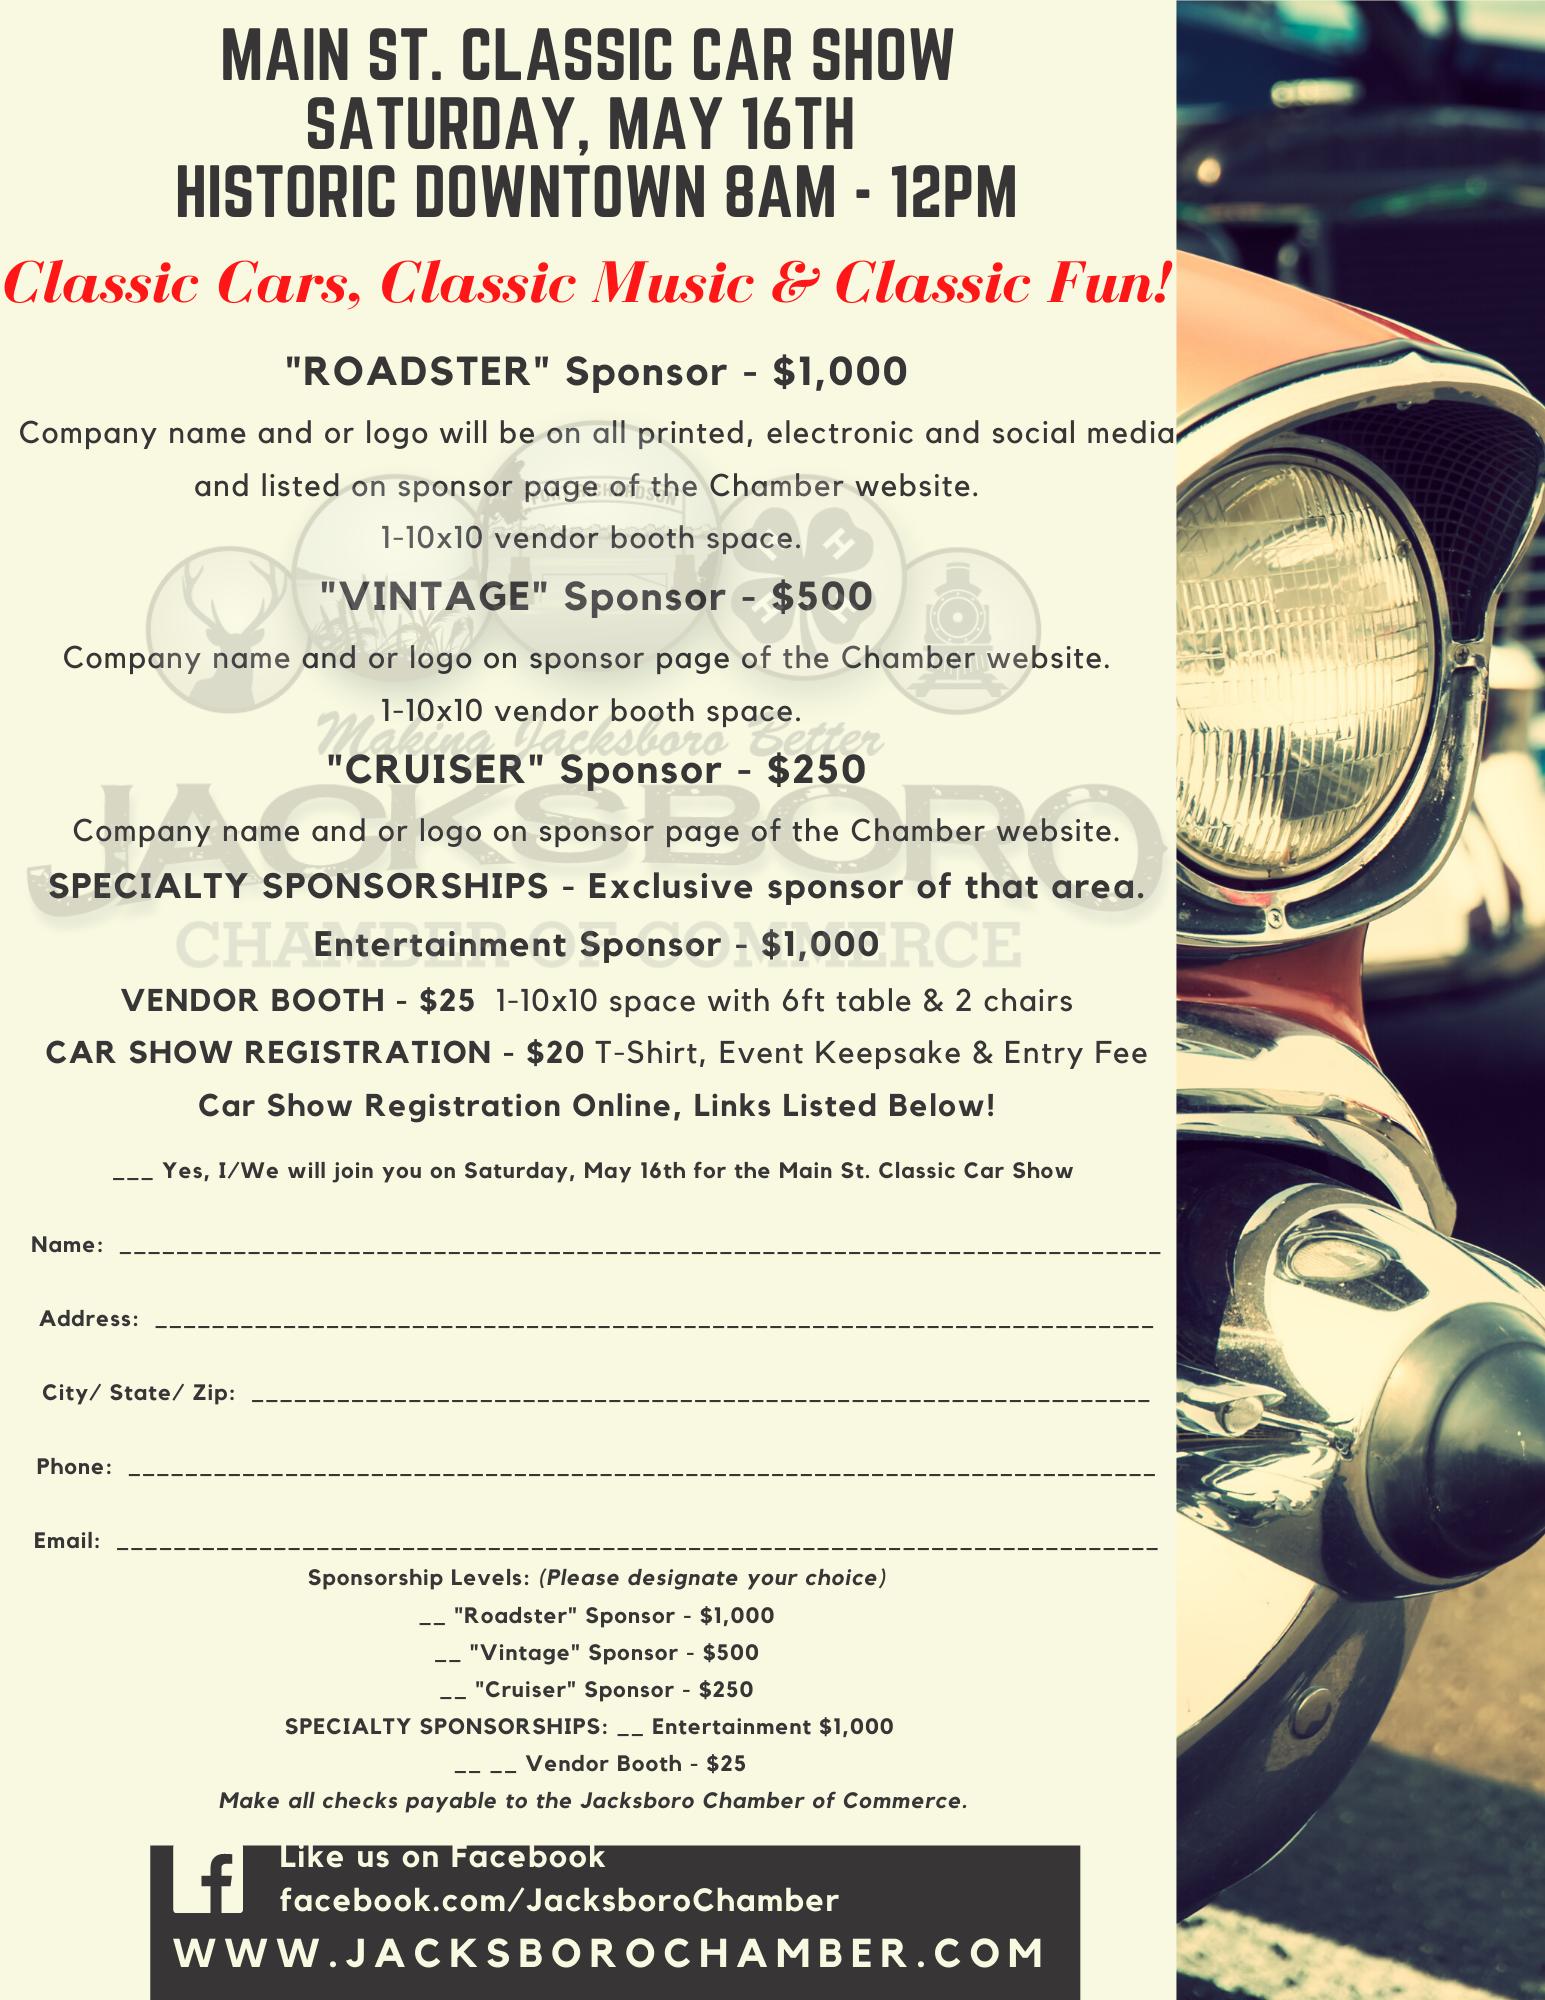 Main St. Classic Car Show - POSTPONED